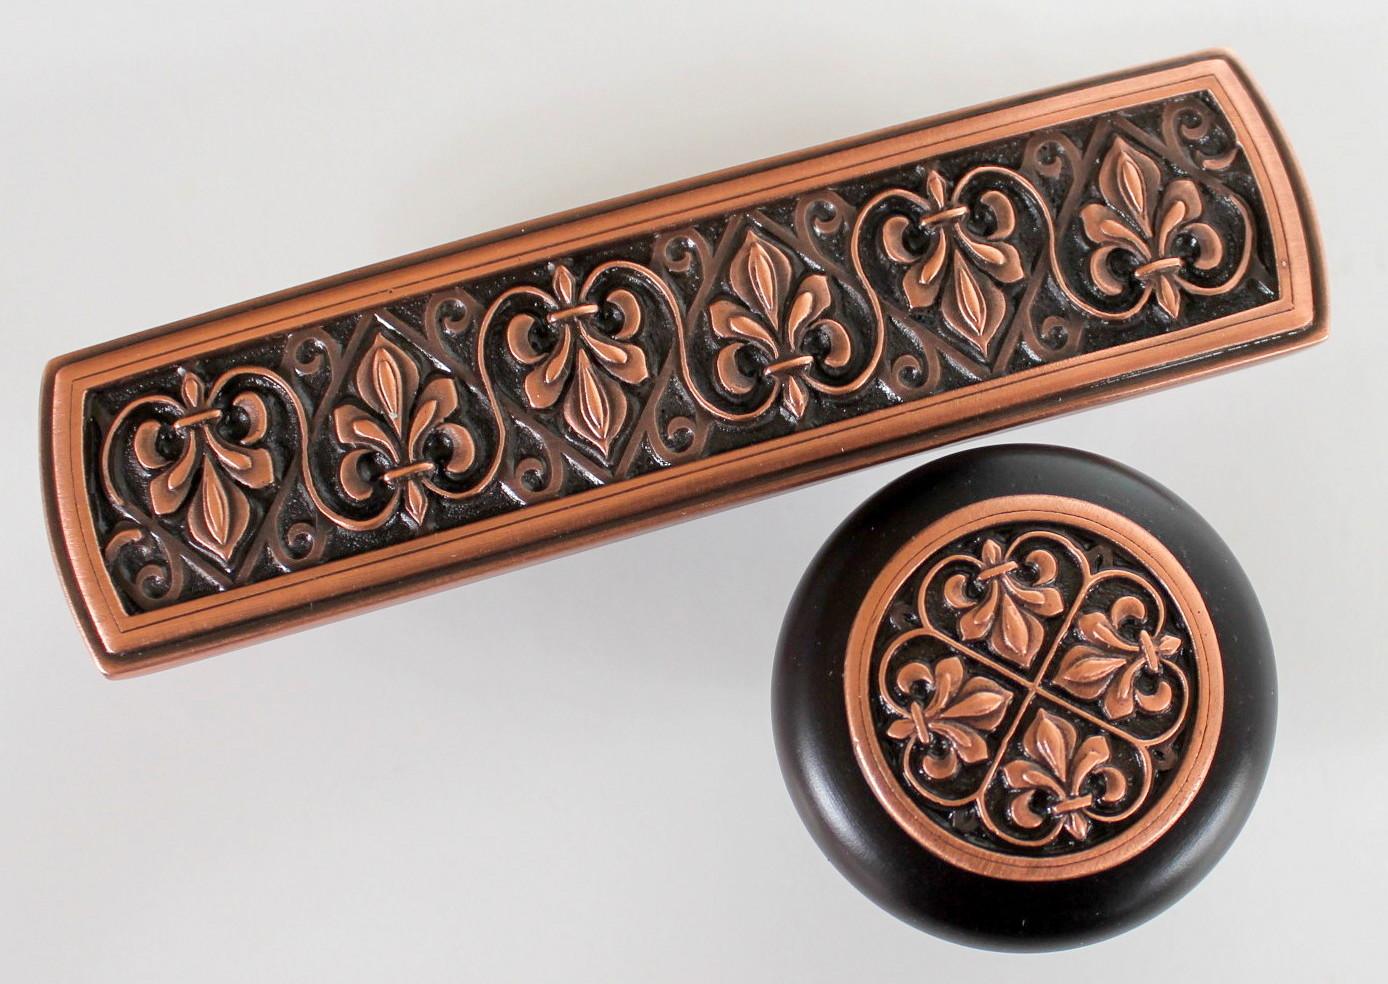 Copper Fleur-de-Lis pull NHP-660 wood knob NHW-760 www.nottinghill-usa.com.JPG